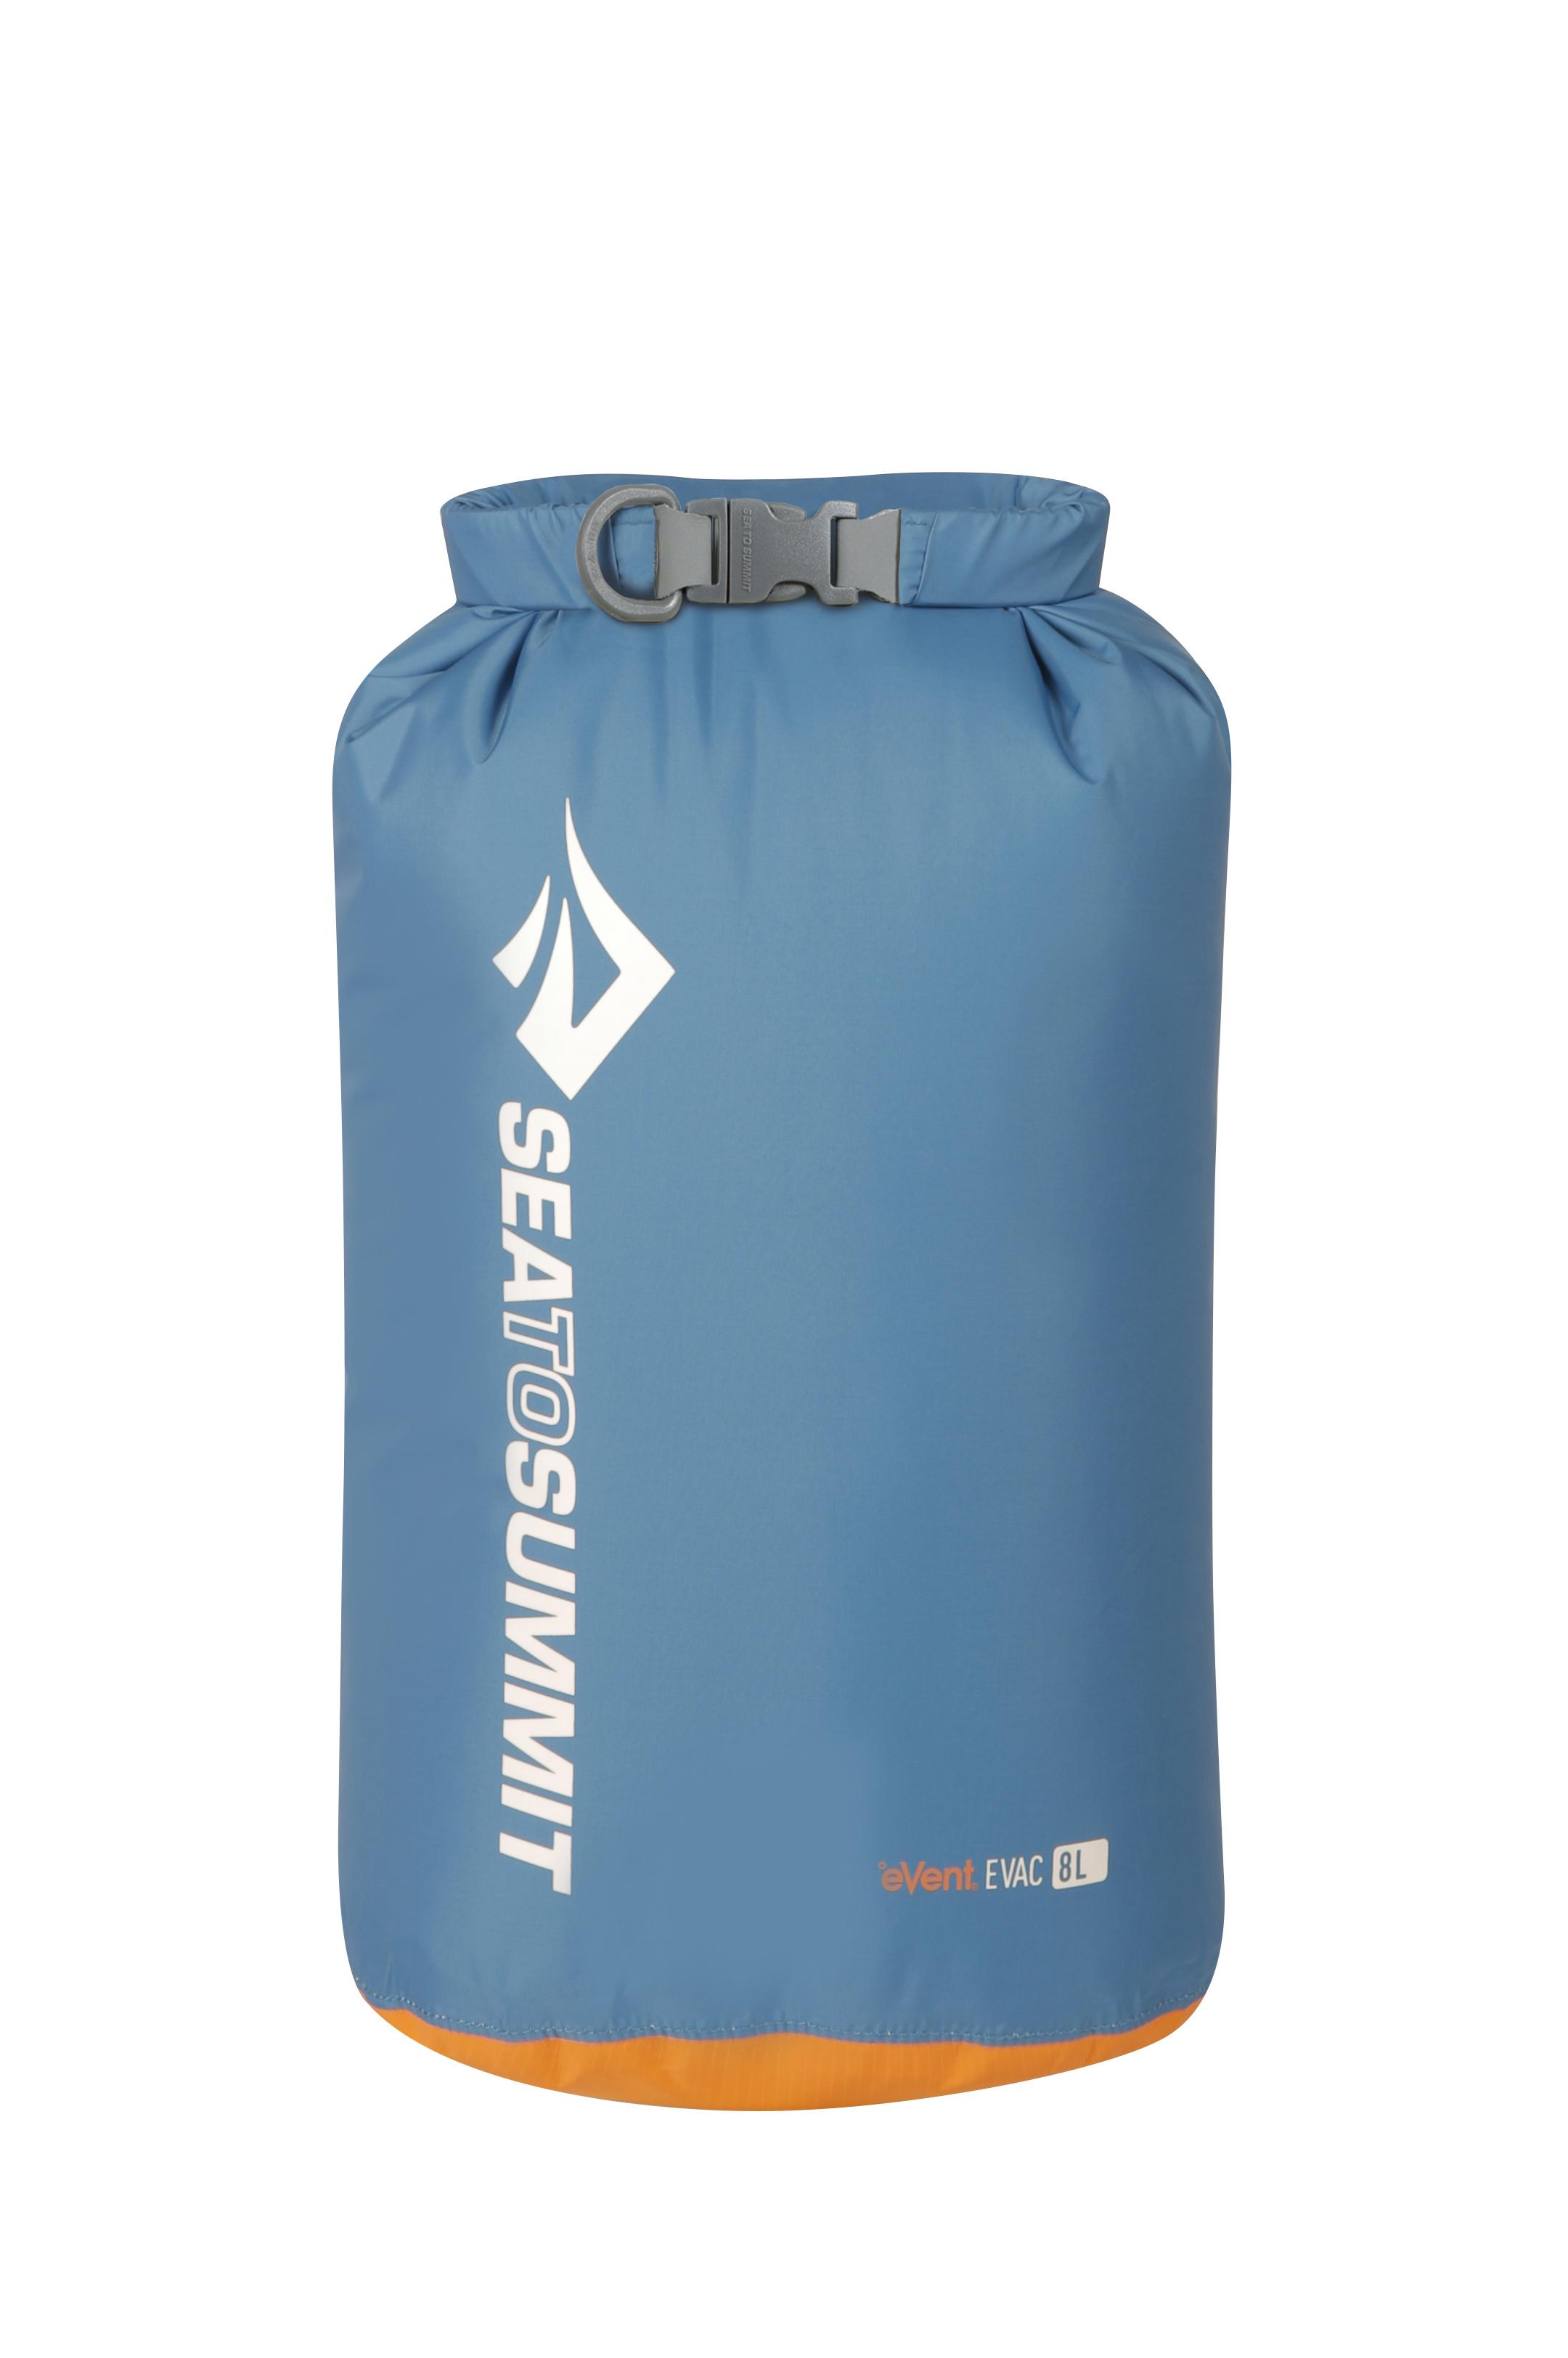 Sea to Summit_eVac Dry Sack_8L_Blue.jpg